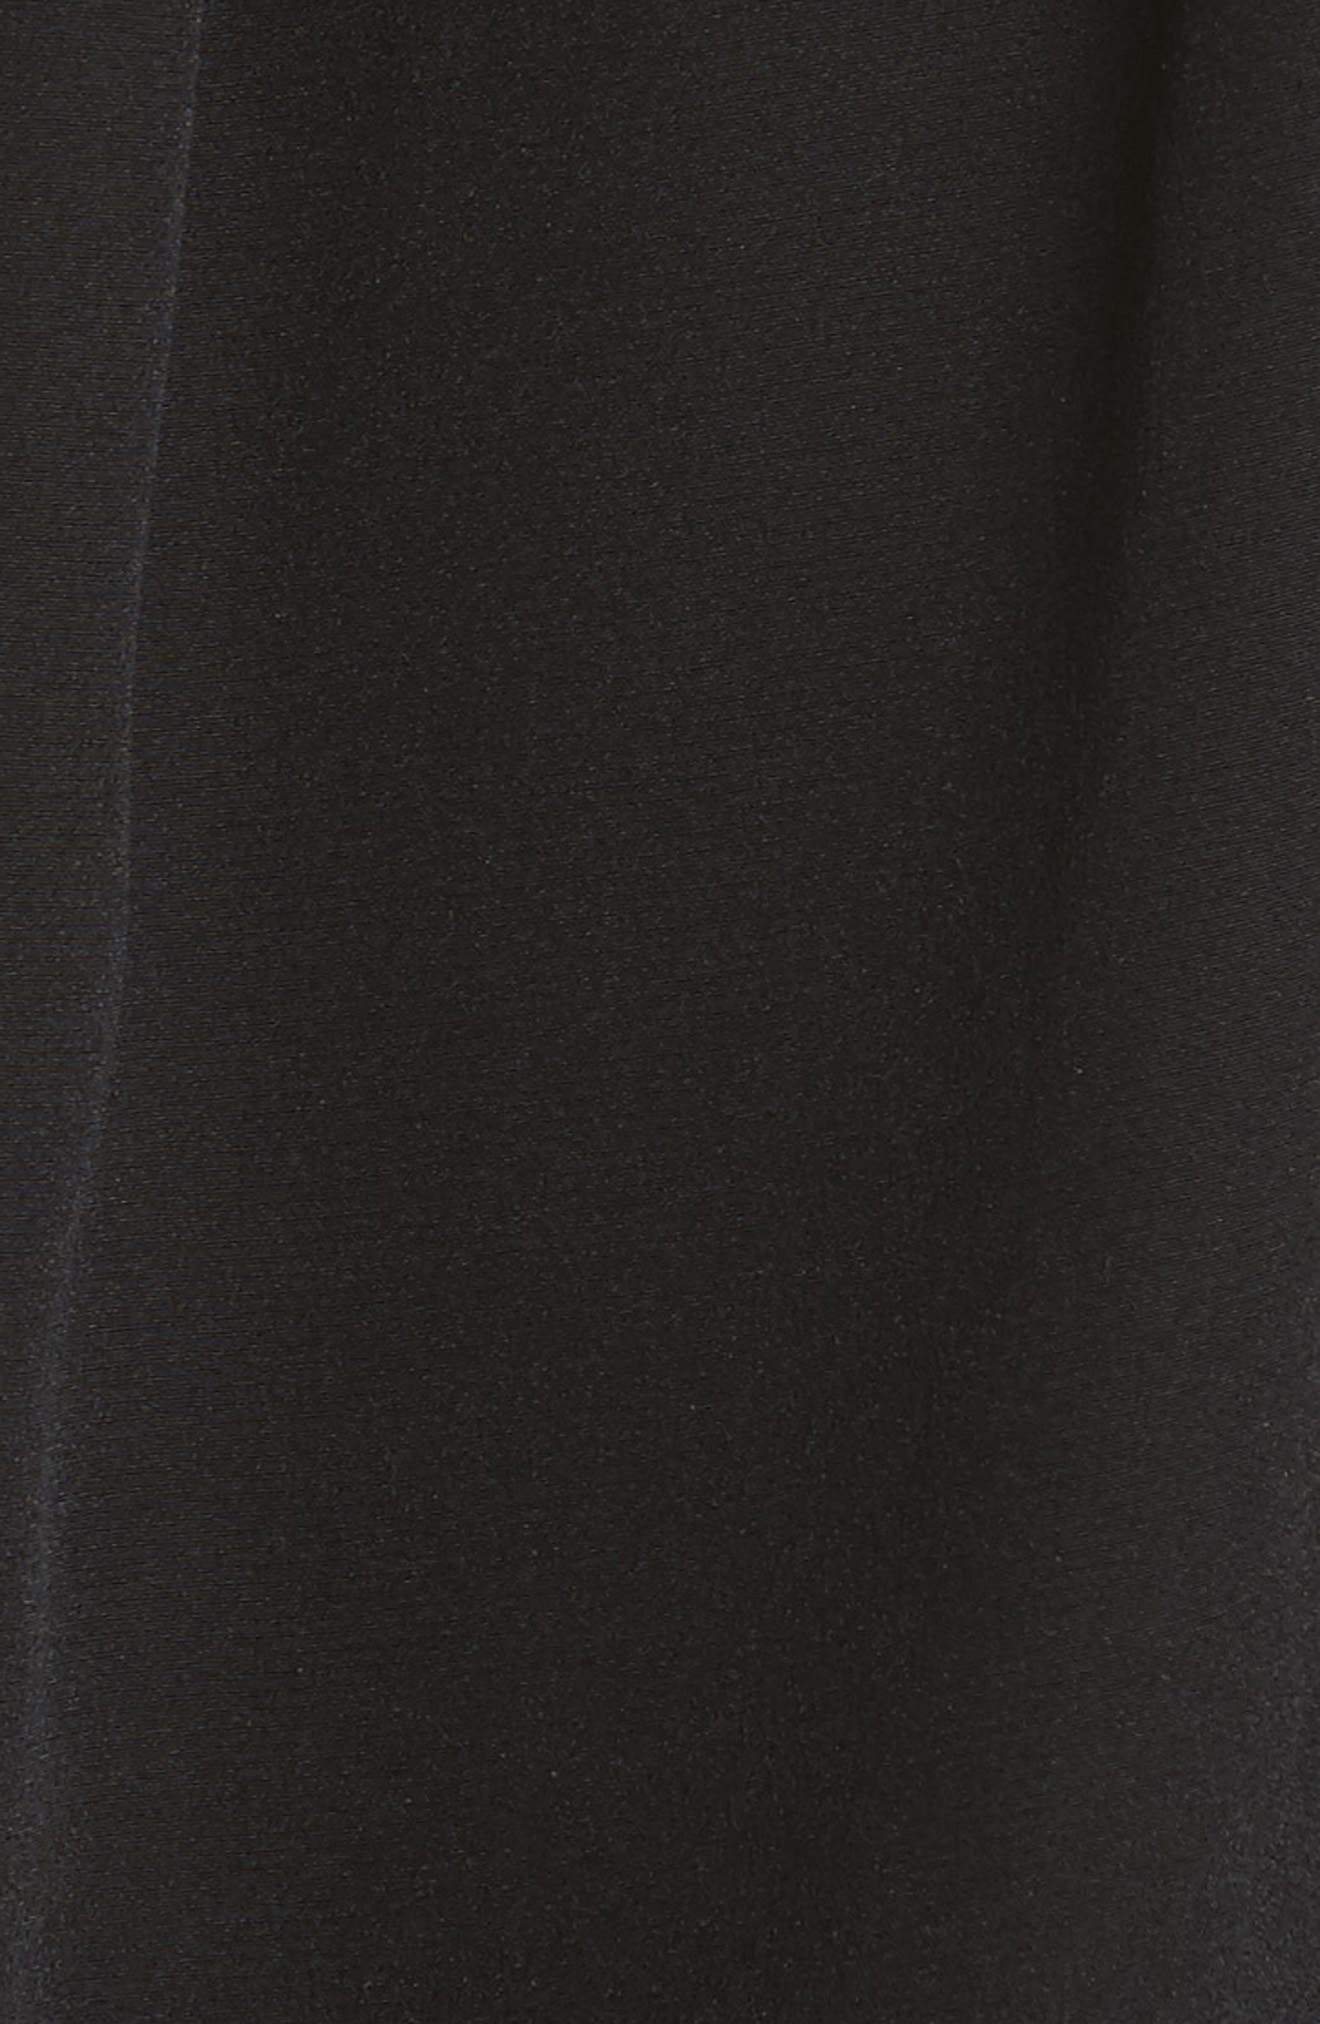 Cutout Silk Top,                             Alternate thumbnail 6, color,                             Black